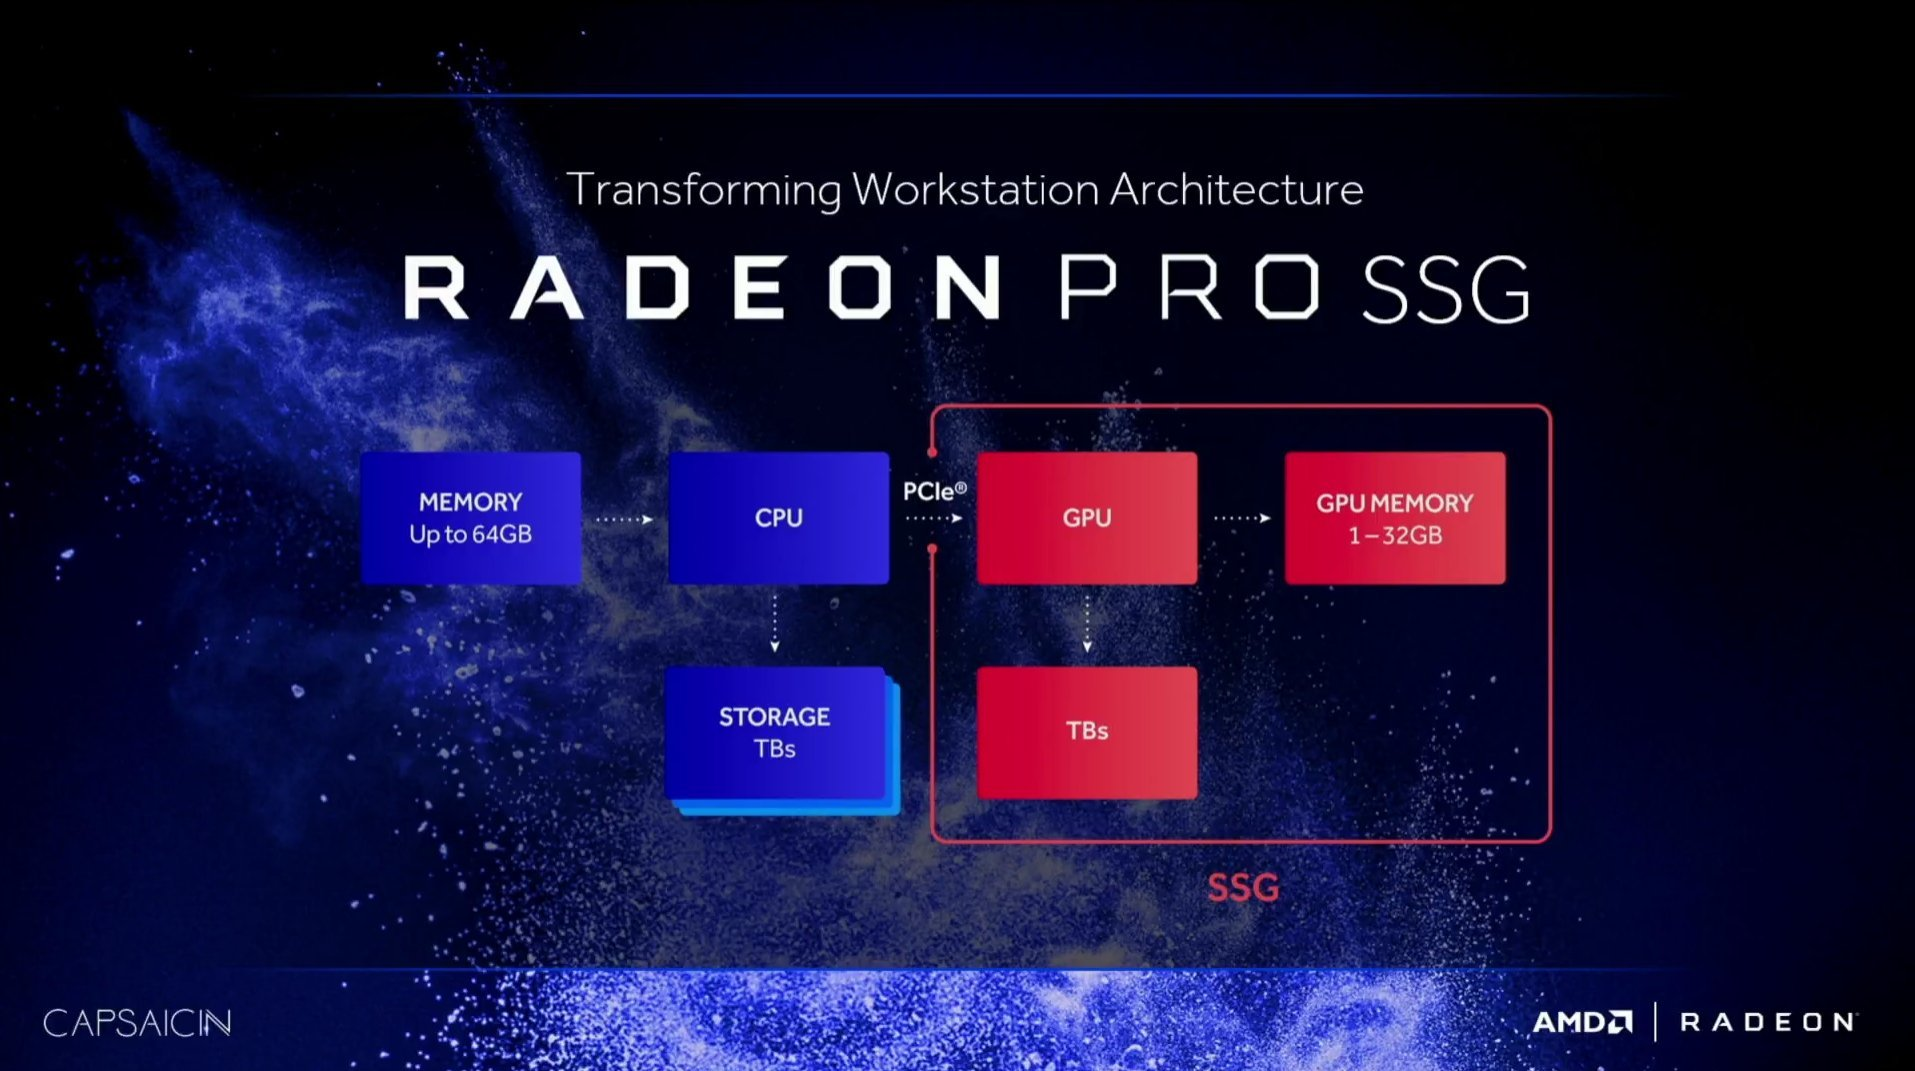 Blockdiagramm AMD Radeon Pro SSG